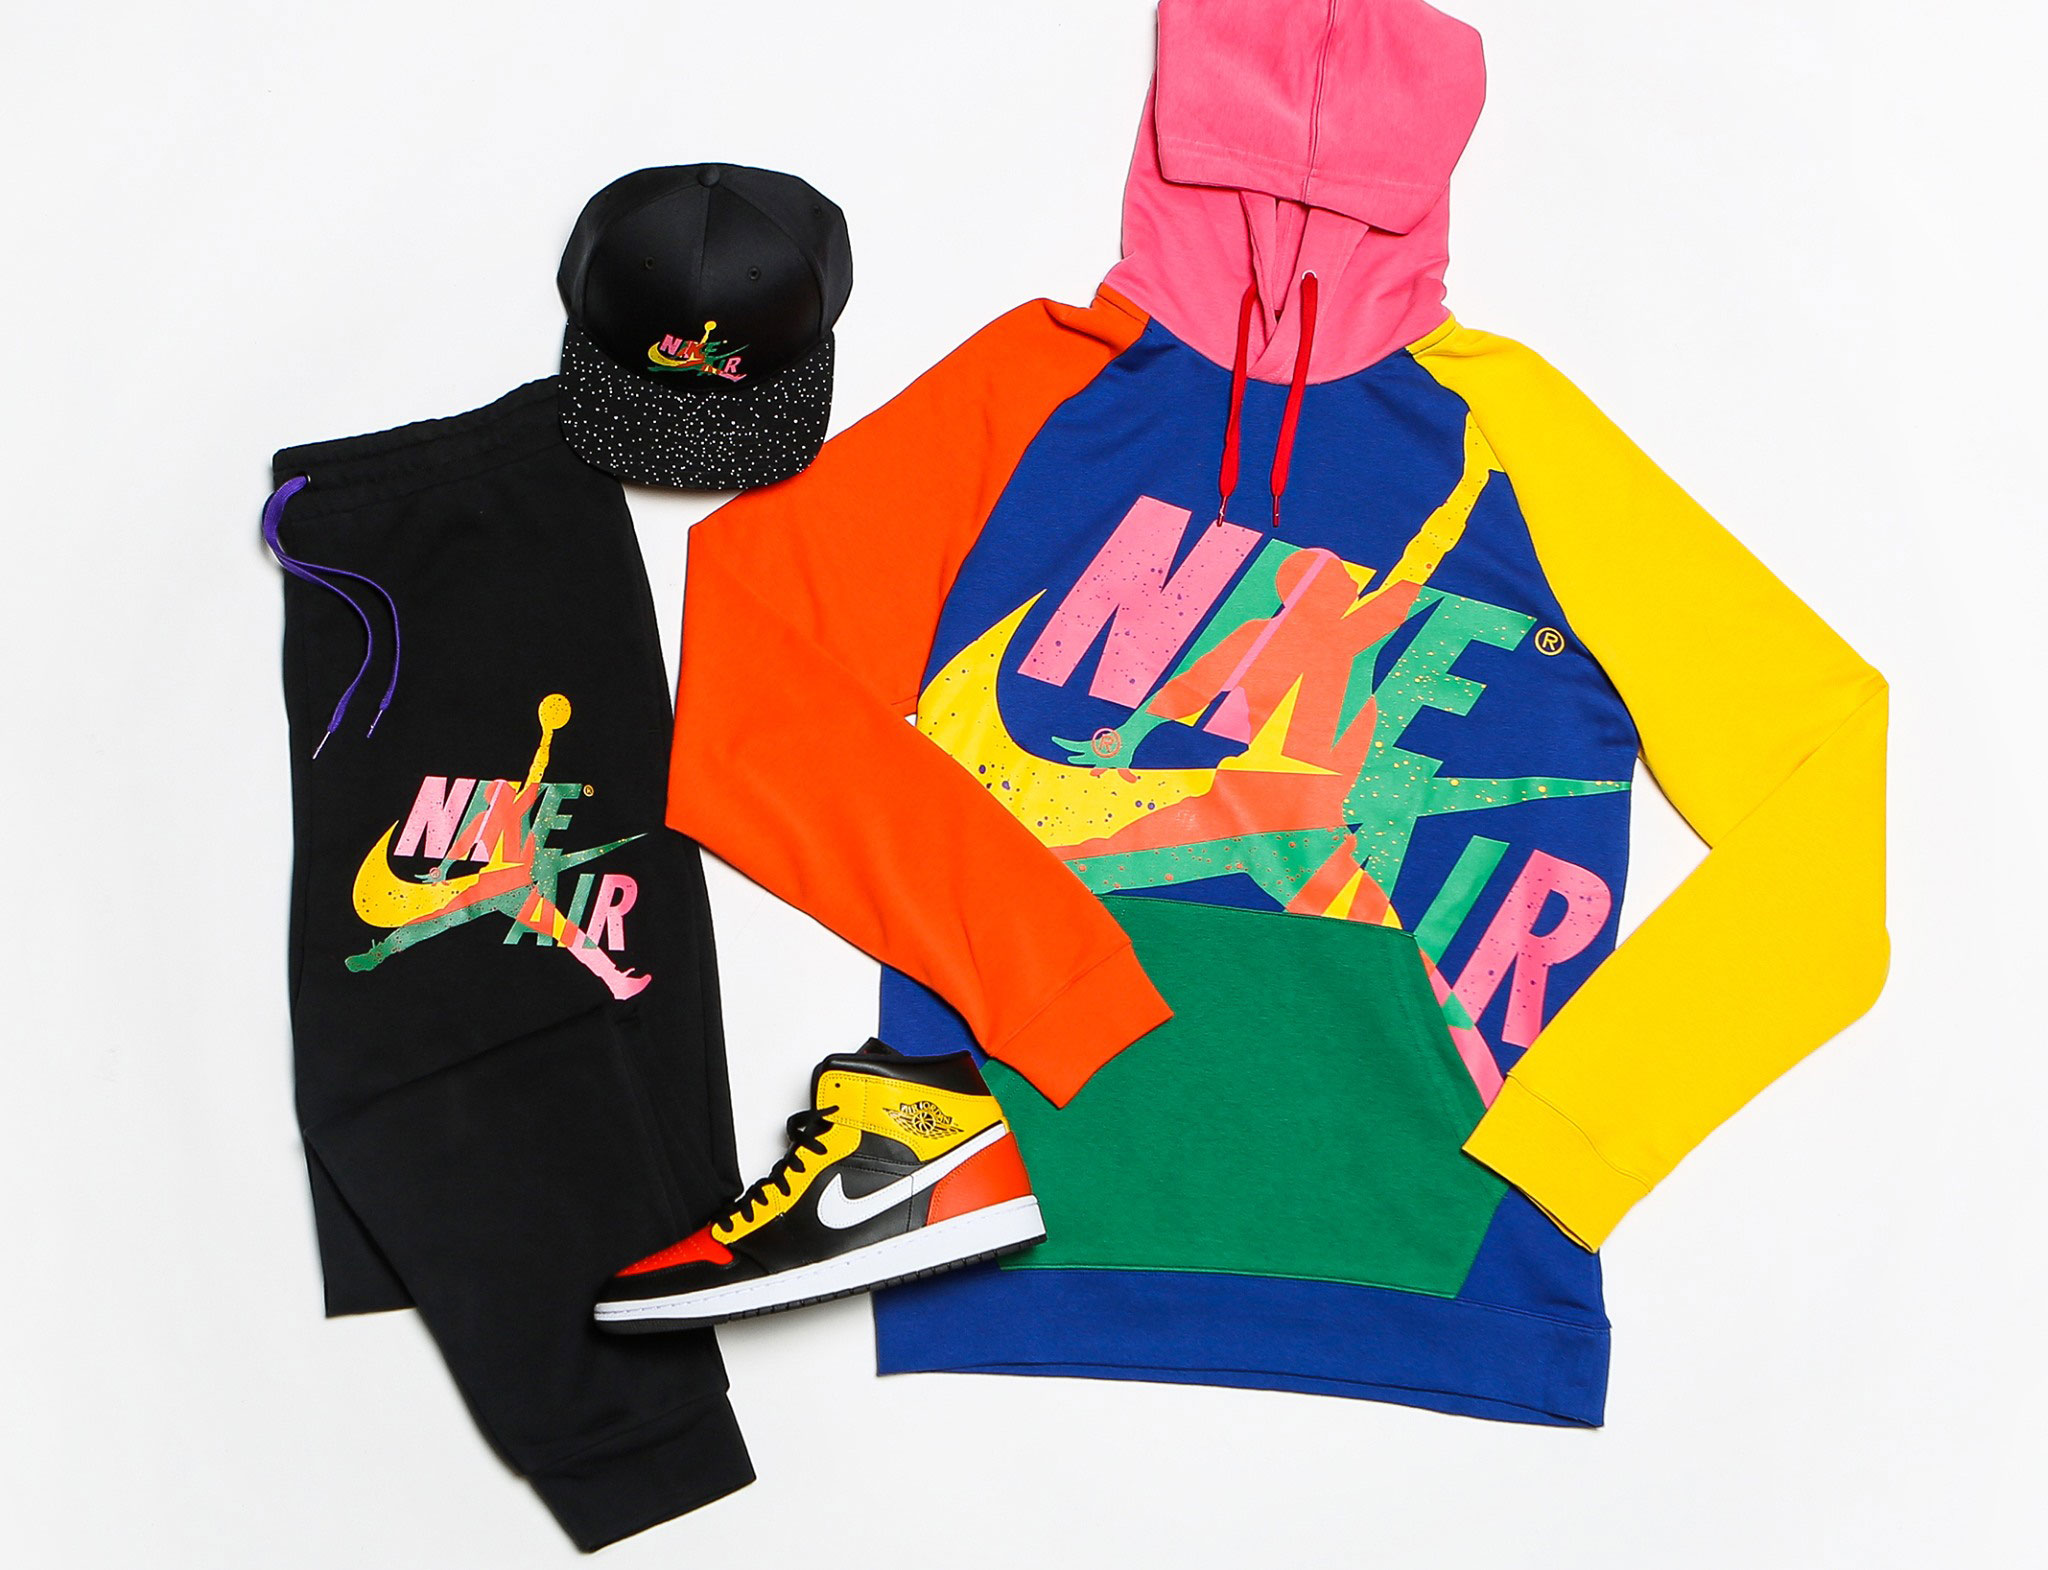 jordan-unite-clothing